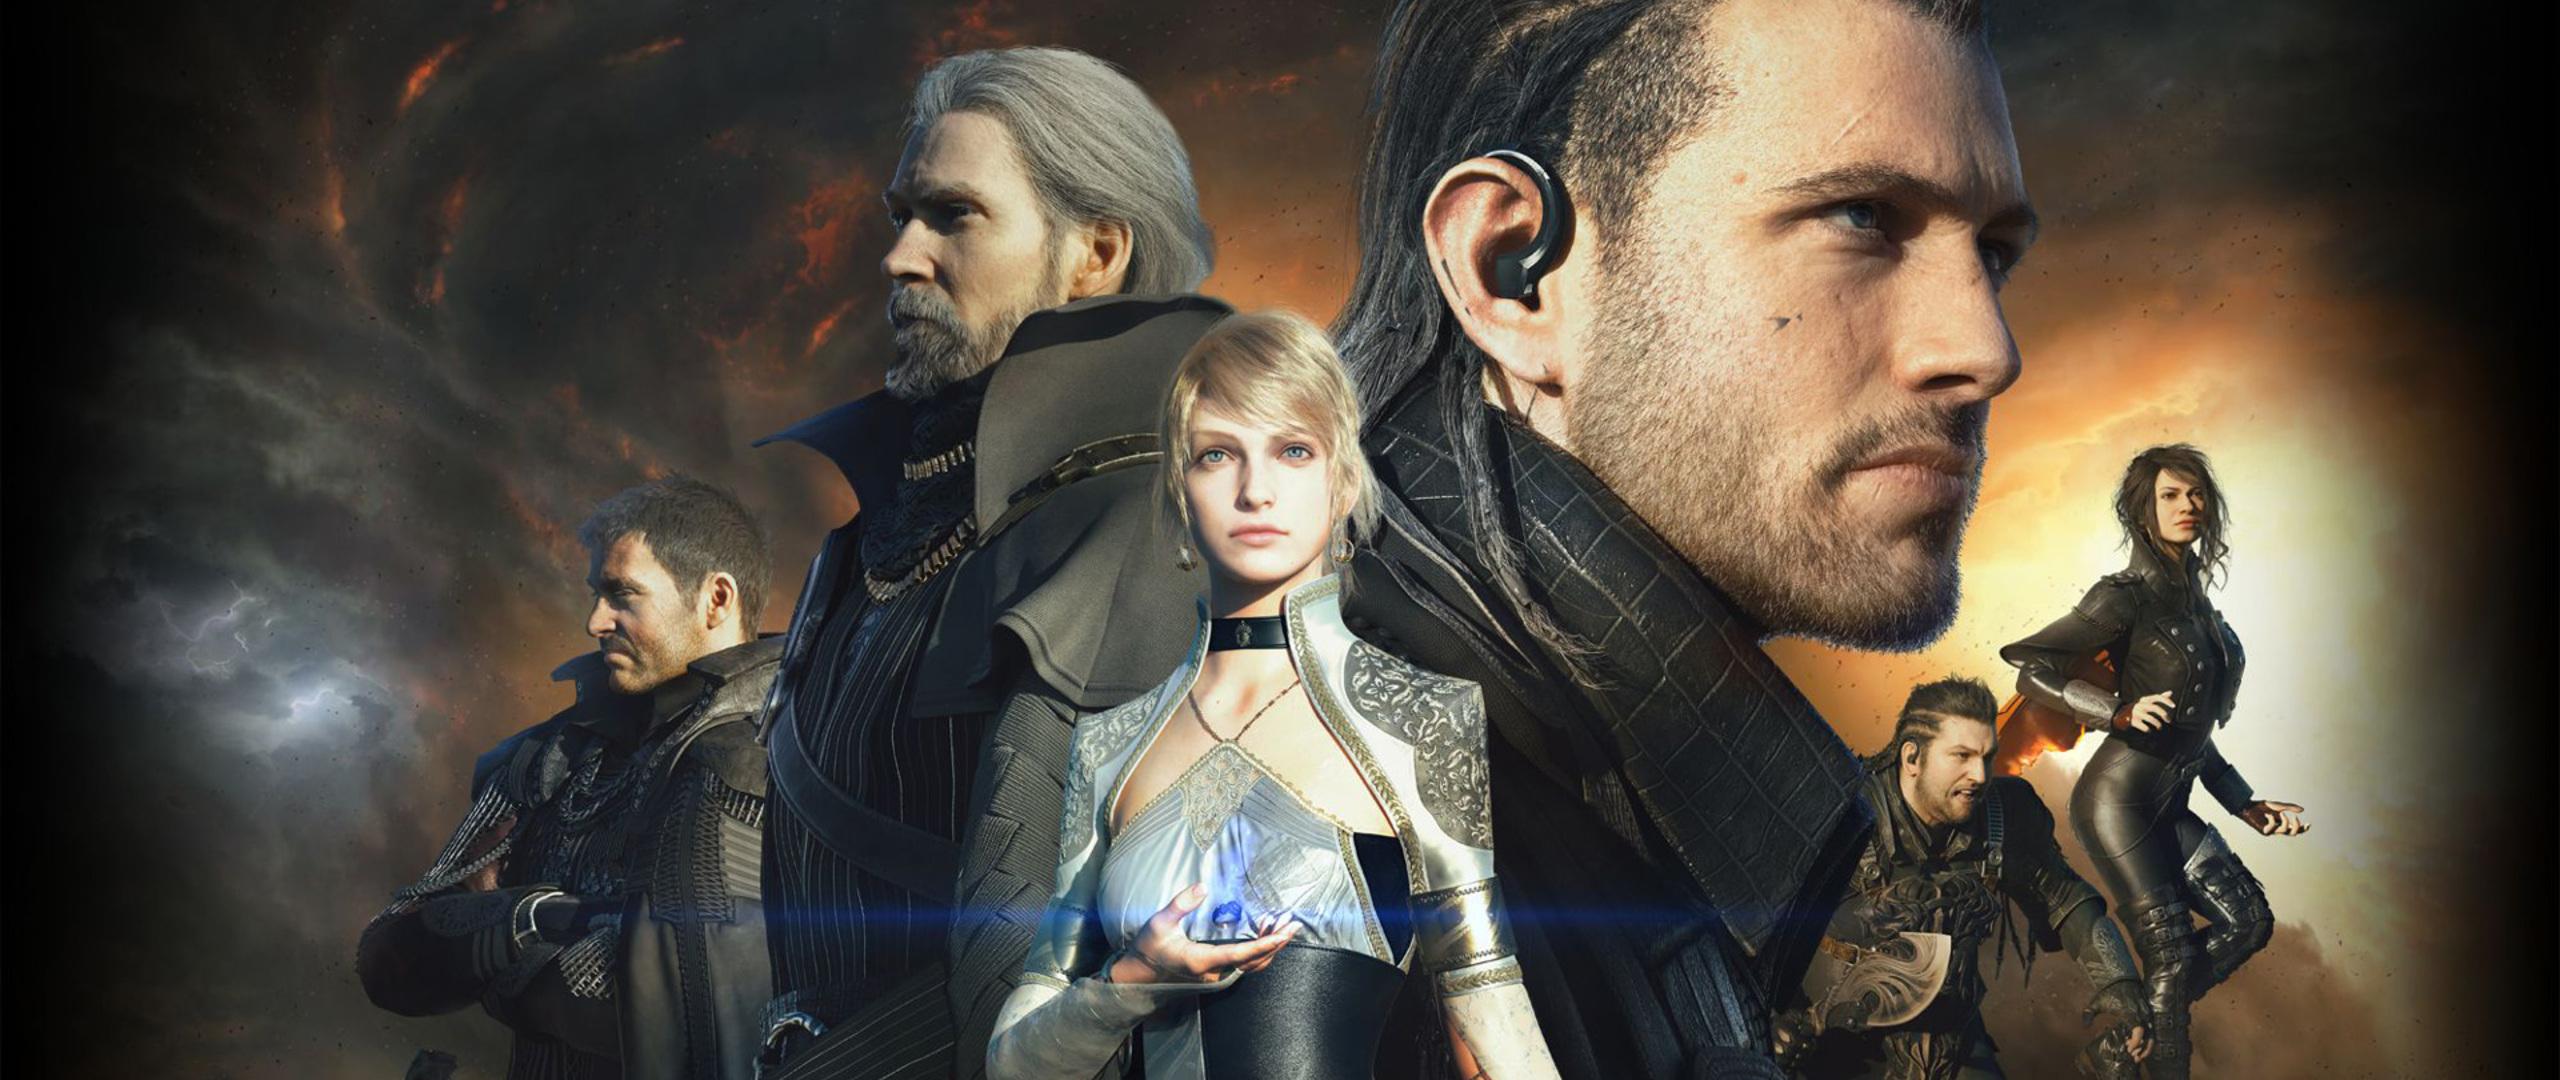 2560x1080 Luna Final Fantasy Xv 4k 2560x1080 Resolution Hd: 2560x1080 Kingsglaive Final Fantasy XV 2560x1080